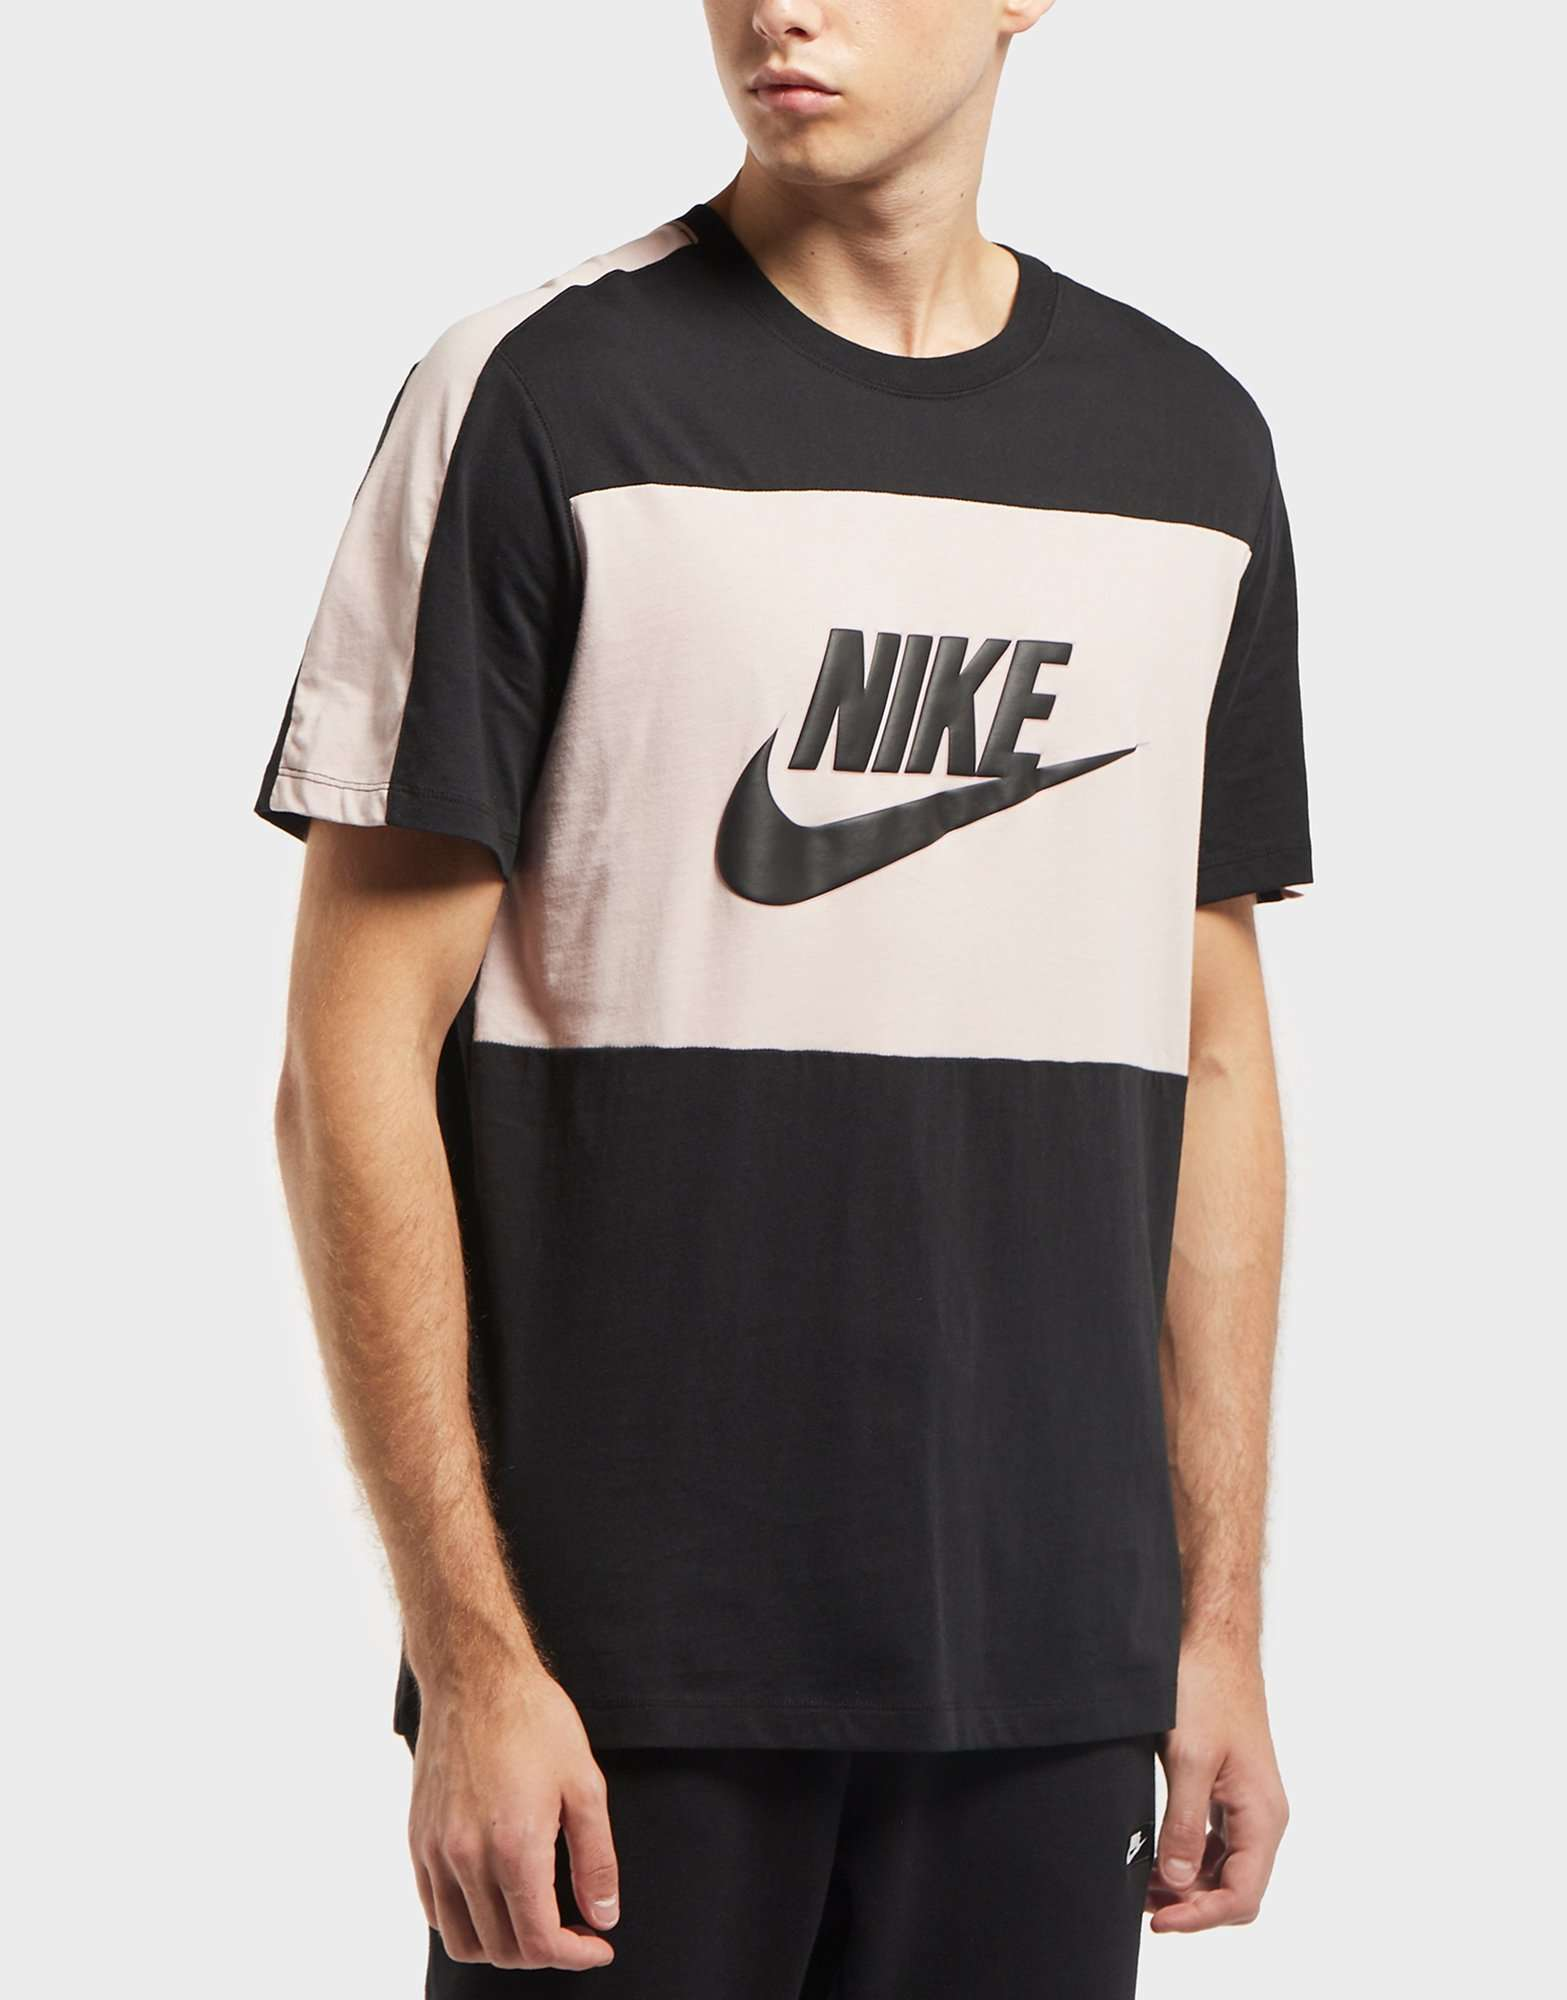 Nike Block Short Sleeve T-Shirt